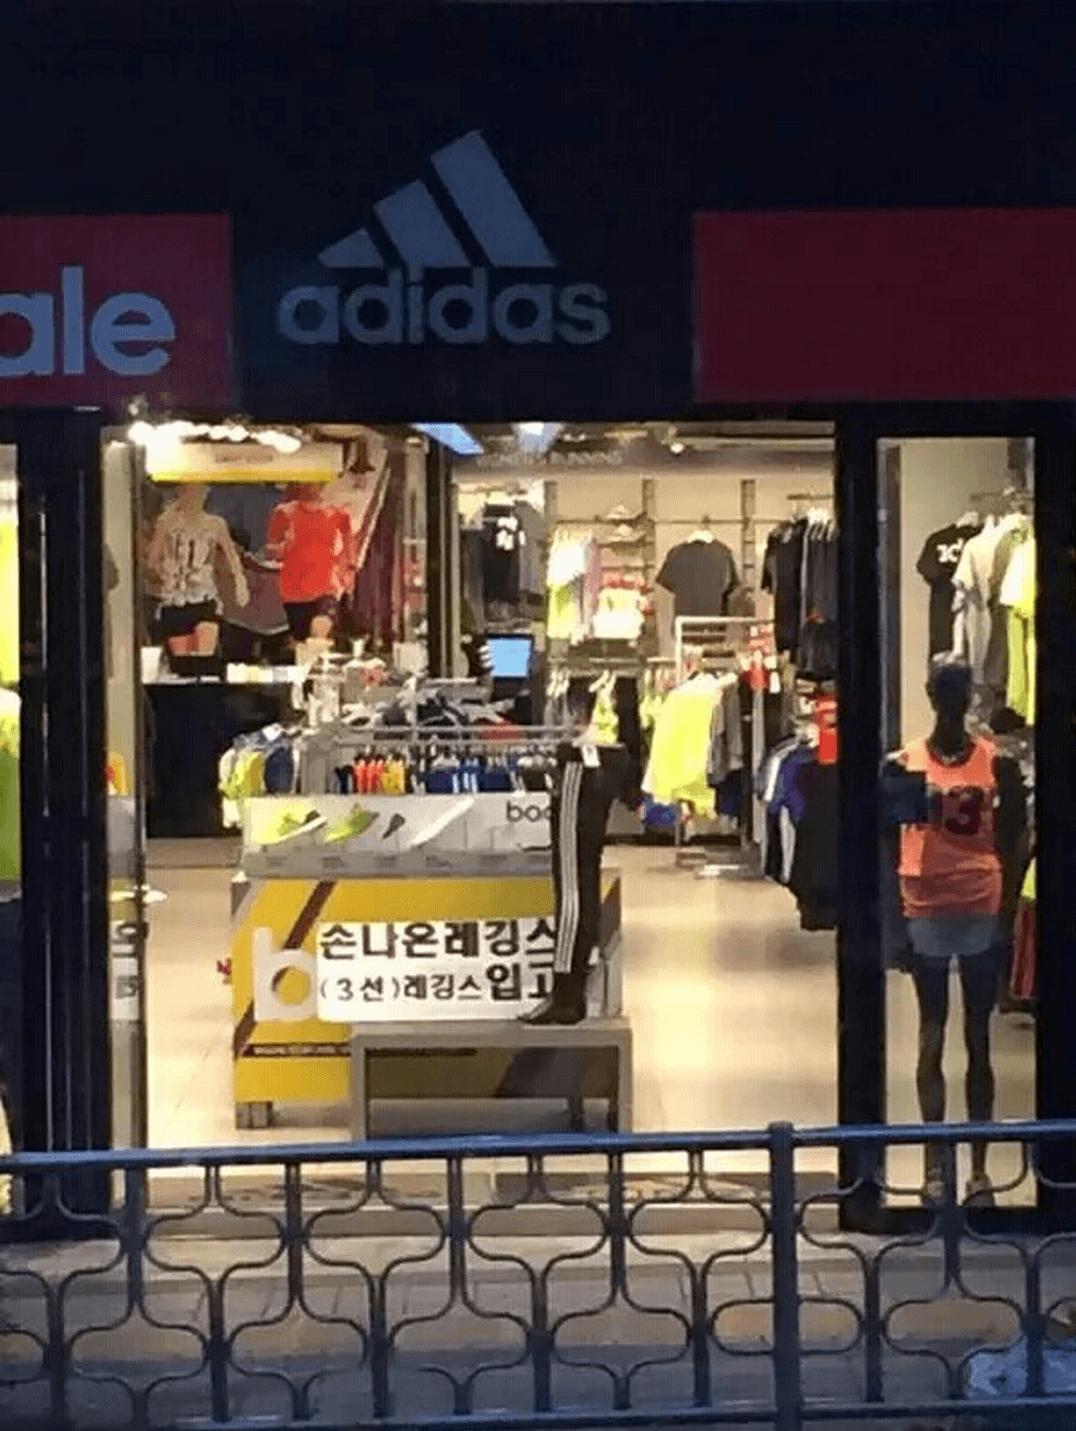 adidas store near here